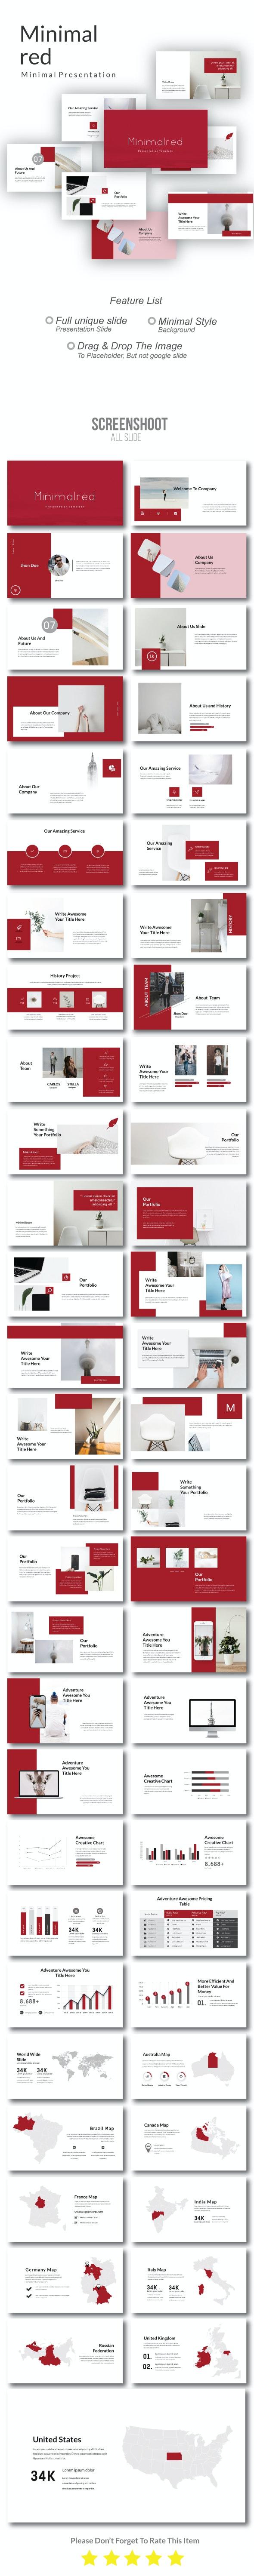 Minimalred Creative Powerpoint - Creative PowerPoint Templates